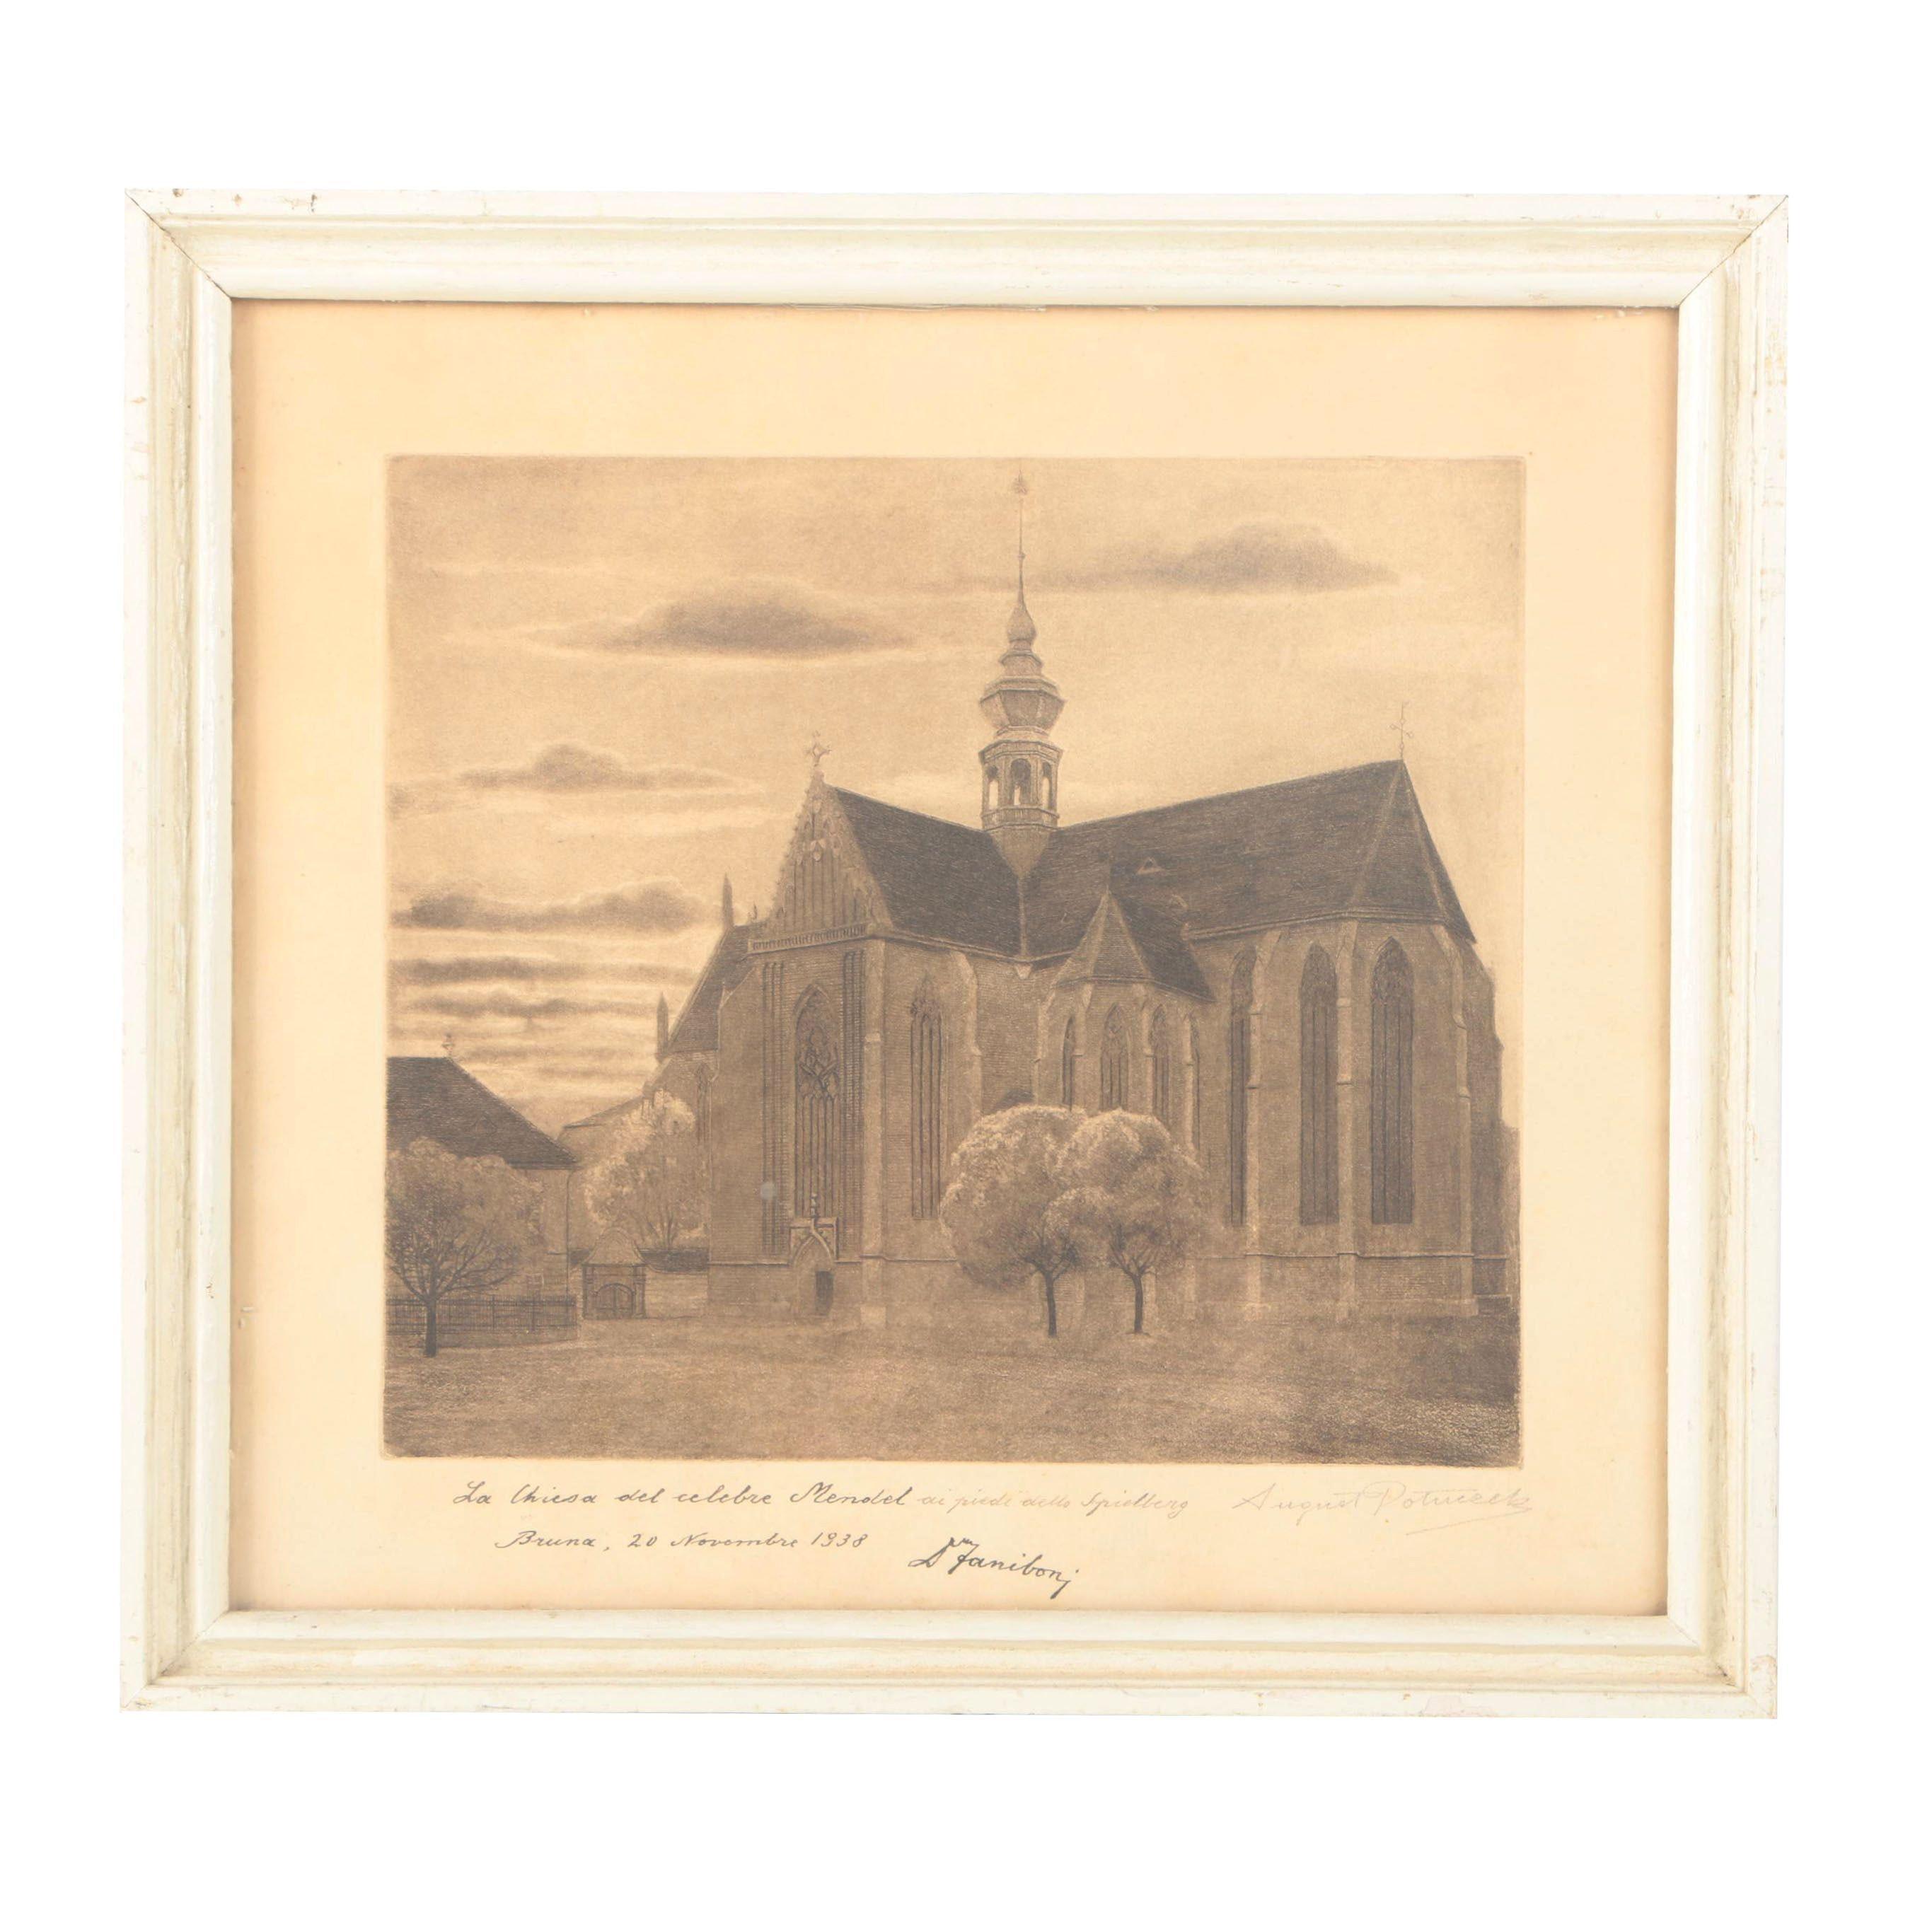 "August Potuceck 1938 Etching With Aquatint on Paper ""La Chiesa del Celebre Menobel"""